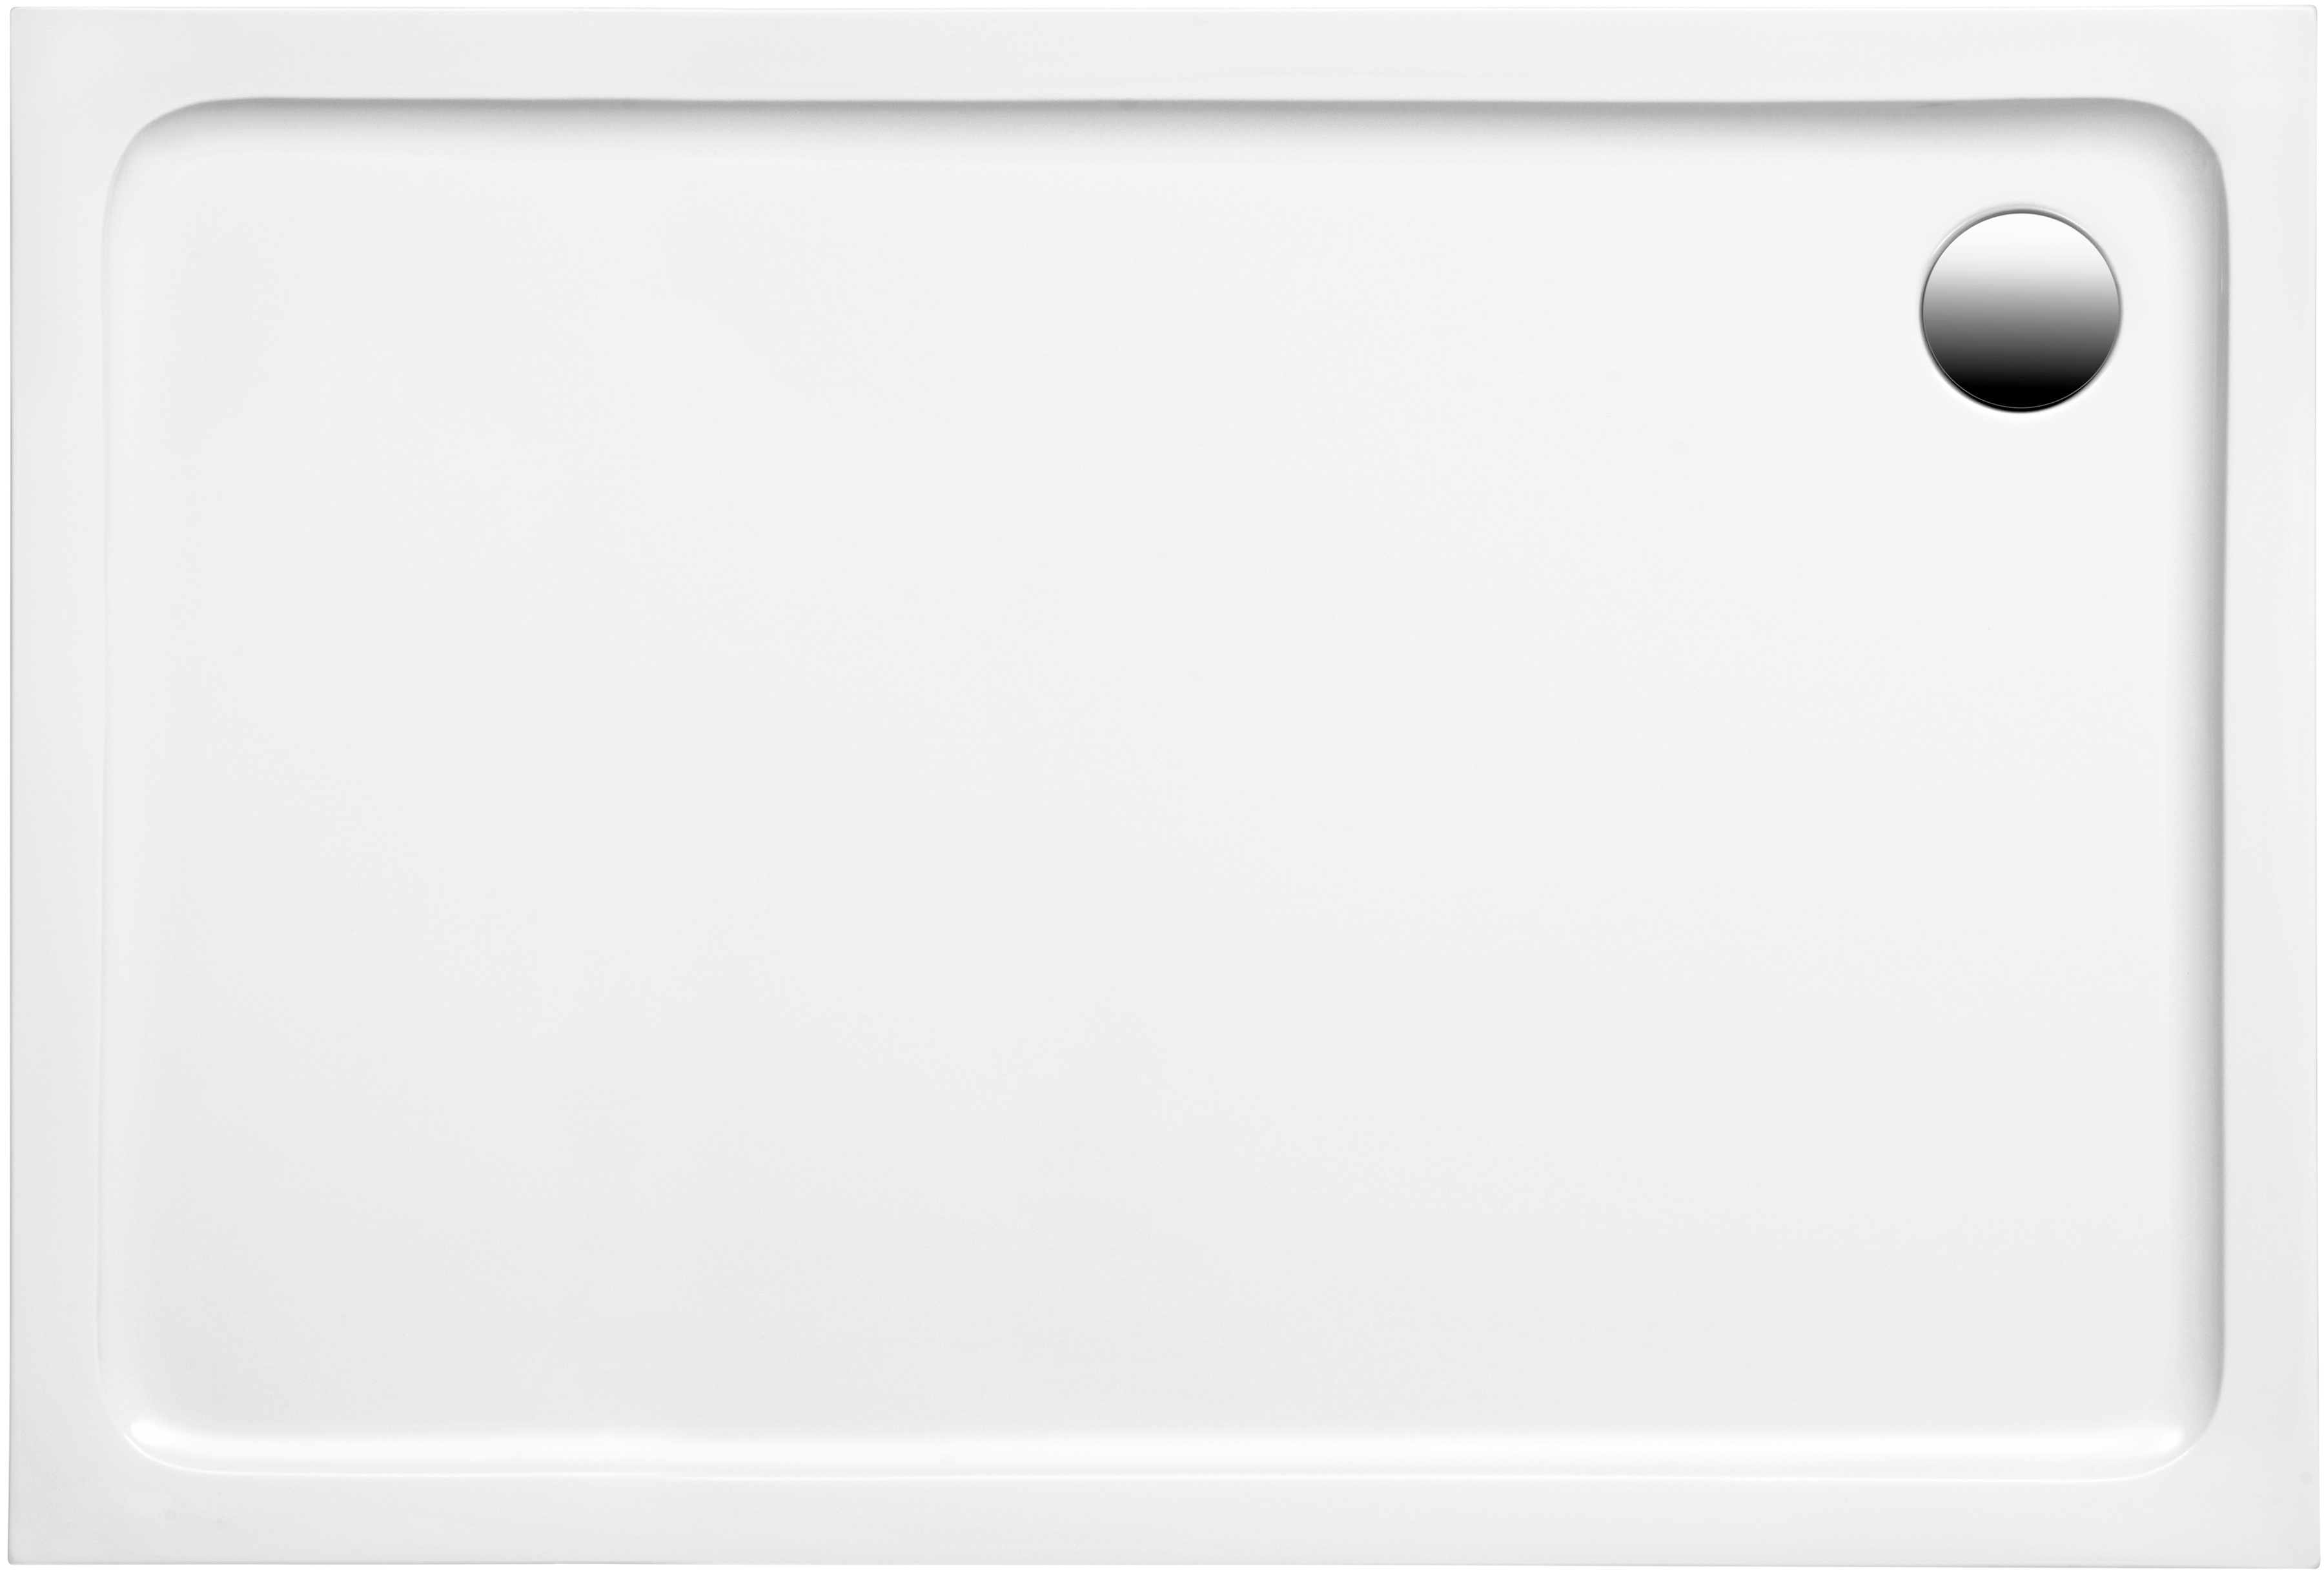 OTTOFOND Duschwanne Set Rechteckduschwanne, 1000x800/30 mm weiß Duschwannen Duschen Bad Sanitär